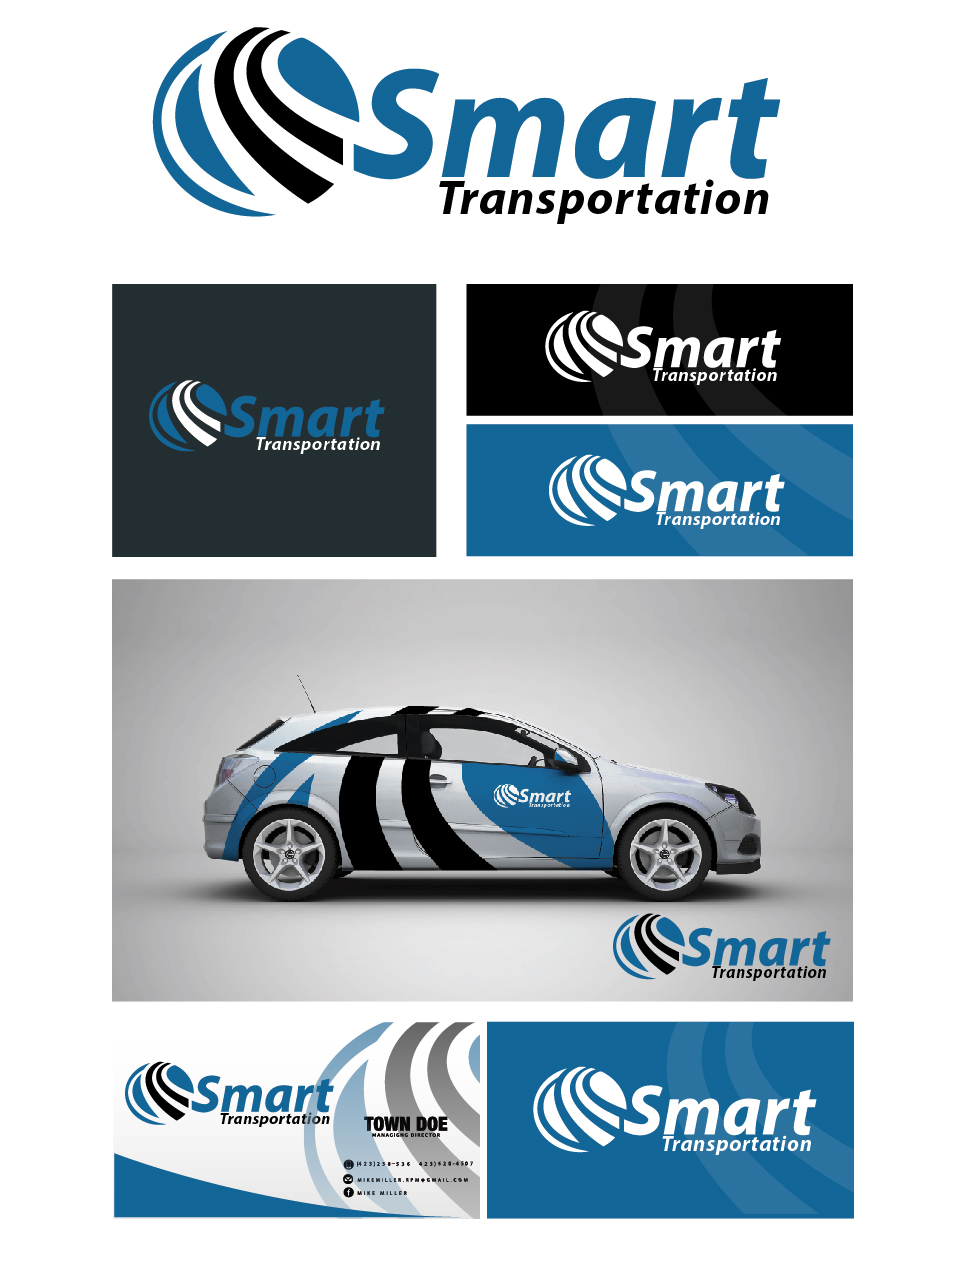 Logo Design by VENTSISLAV KOVACHEV - Entry No. 196 in the Logo Design Contest Imaginative Logo Design for Smart Transportation.